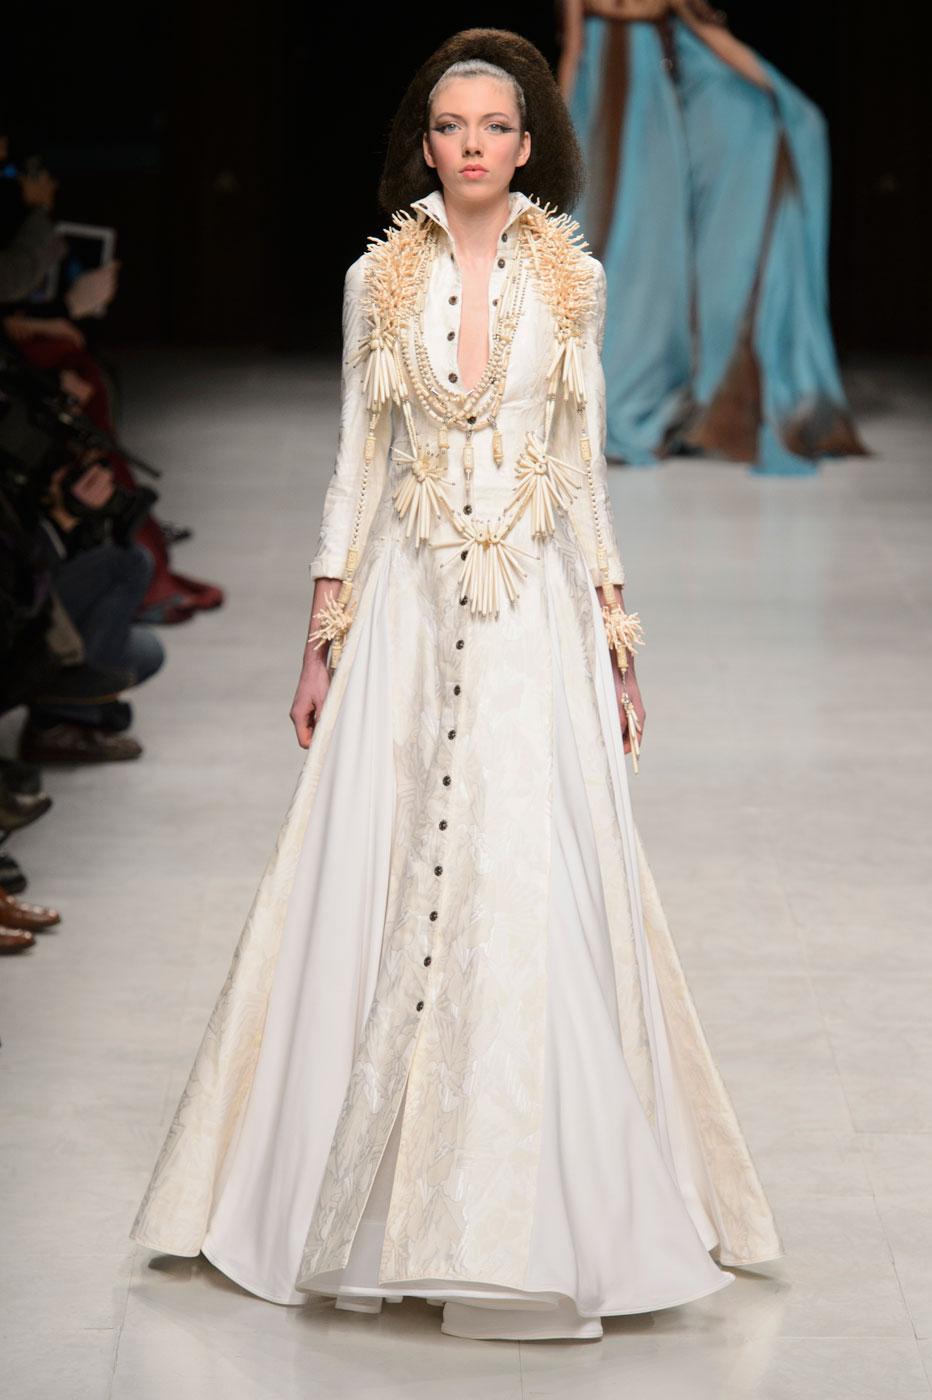 Julien-Fournie-Prive-fashion-runway-show-haute-couture-paris-spring-2015-the-impression-56